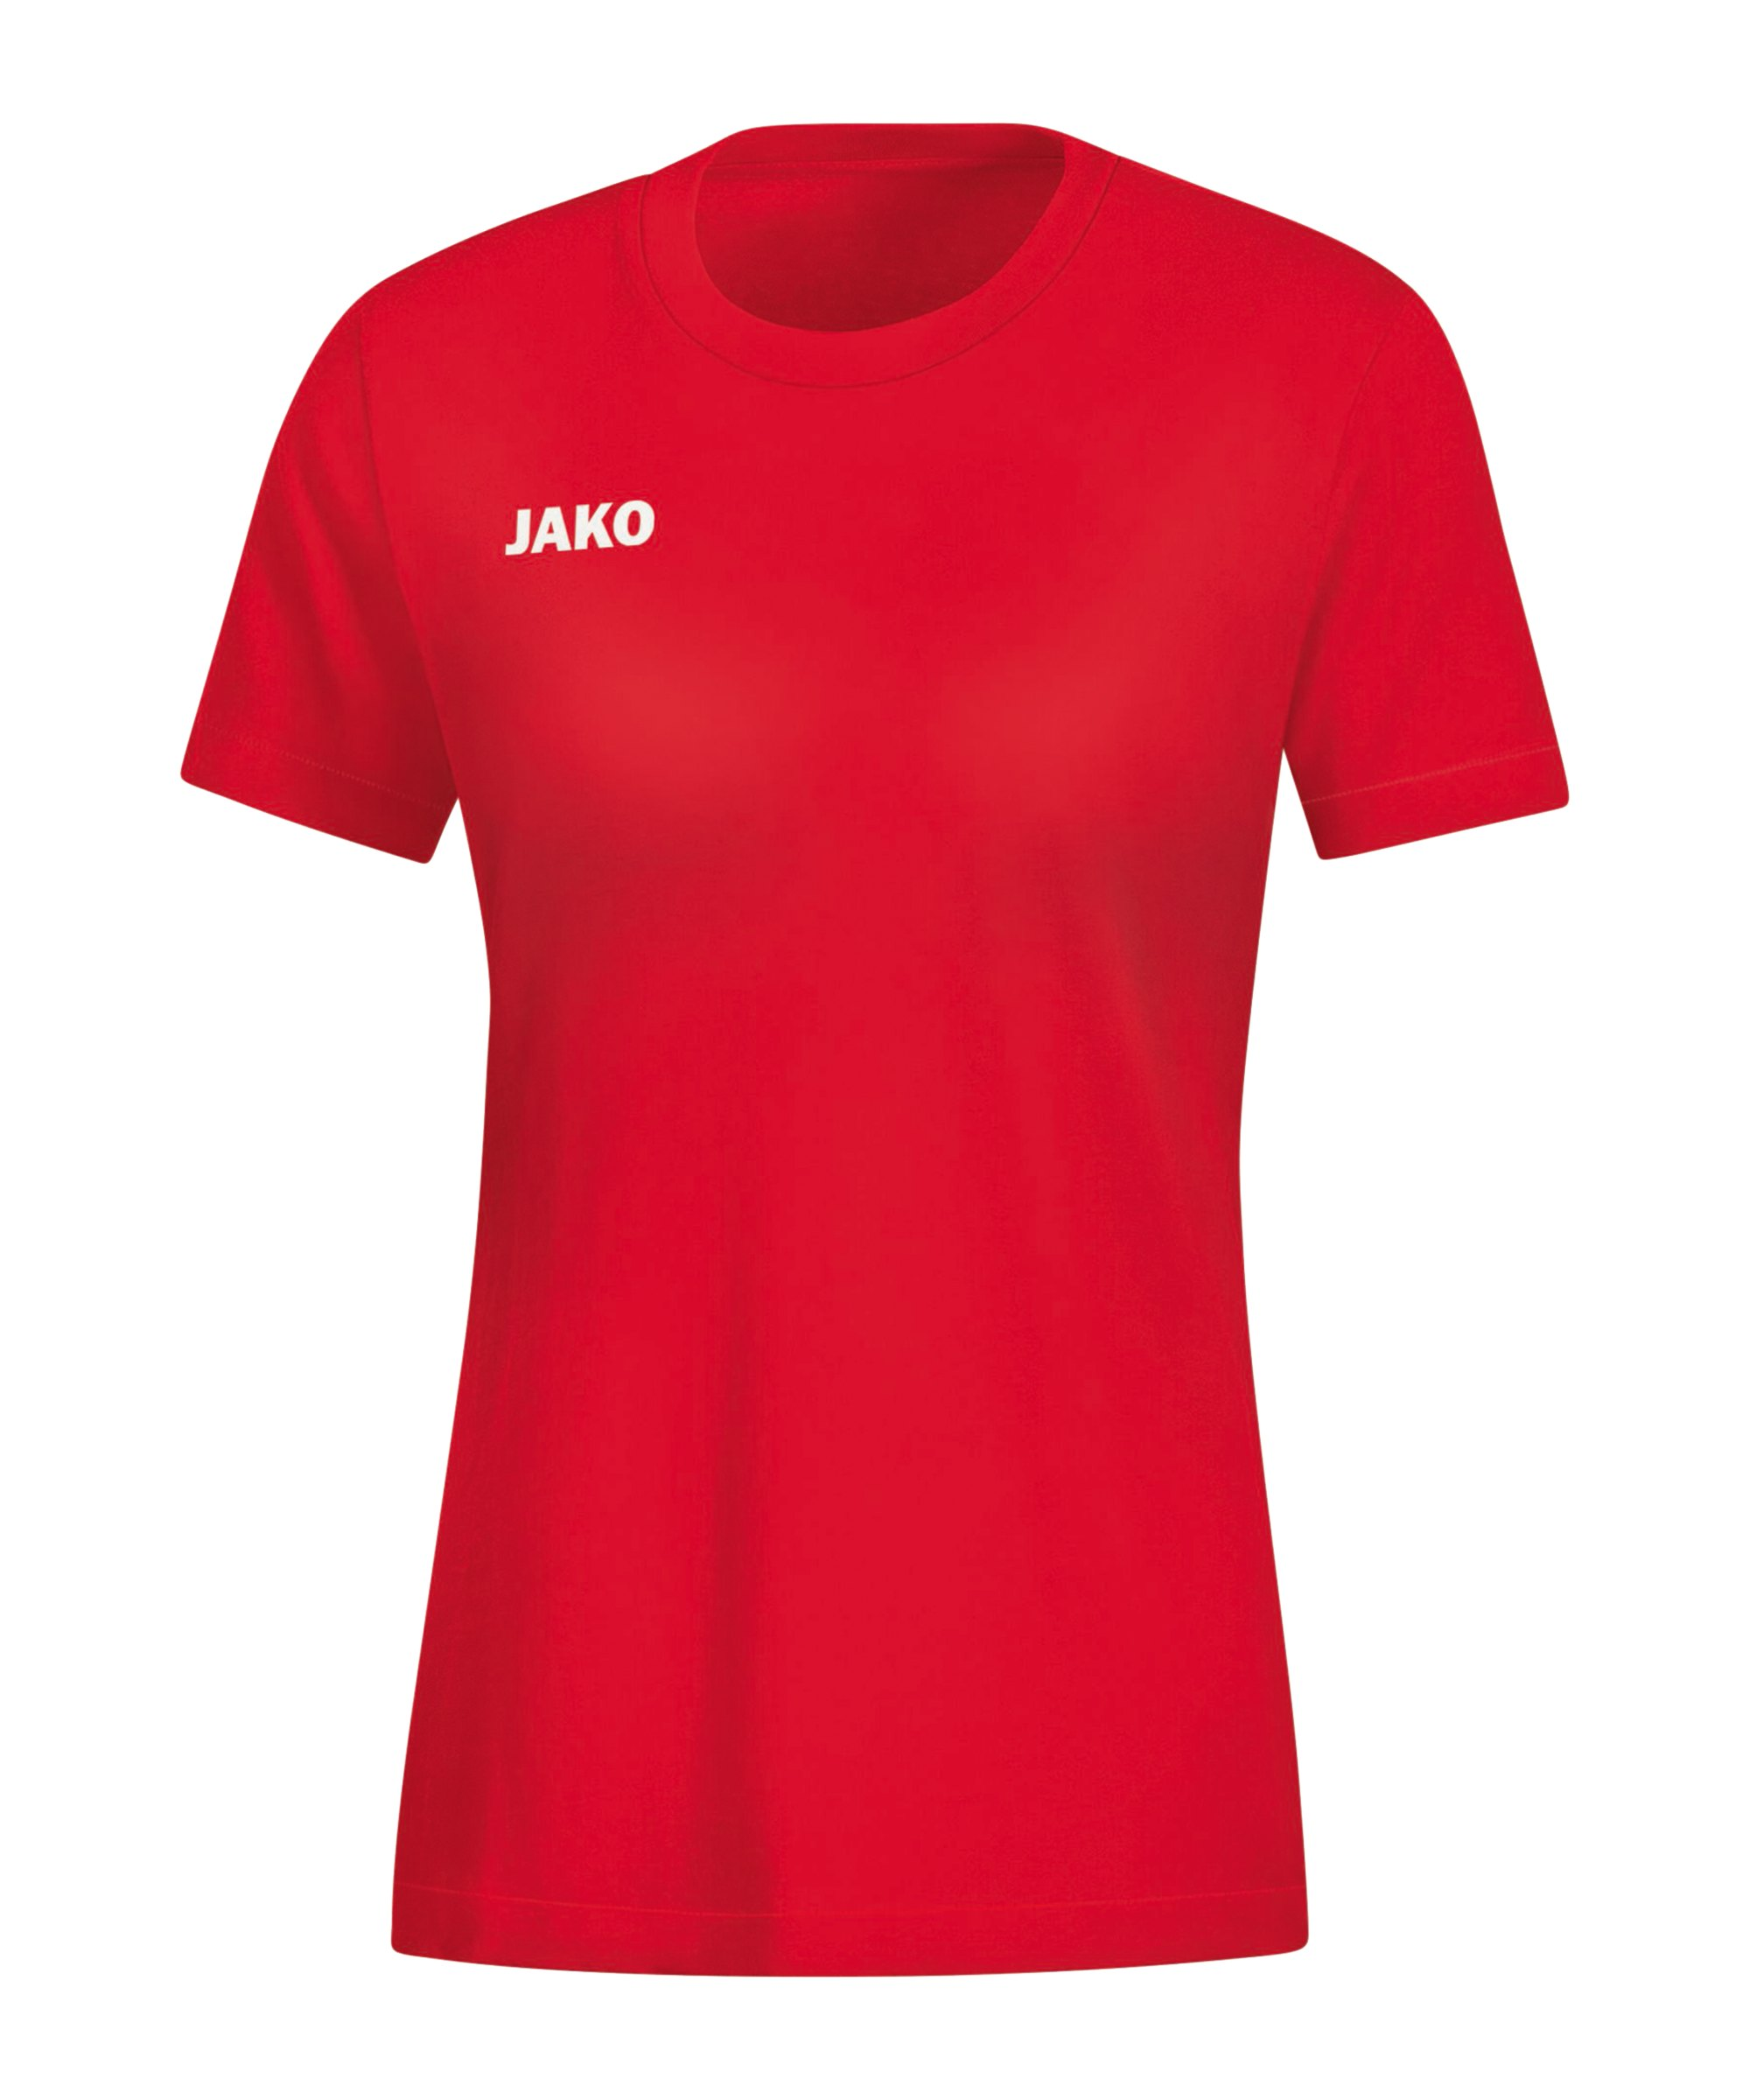 JAKO Base T-Shirt Damen Rot F01 - rot